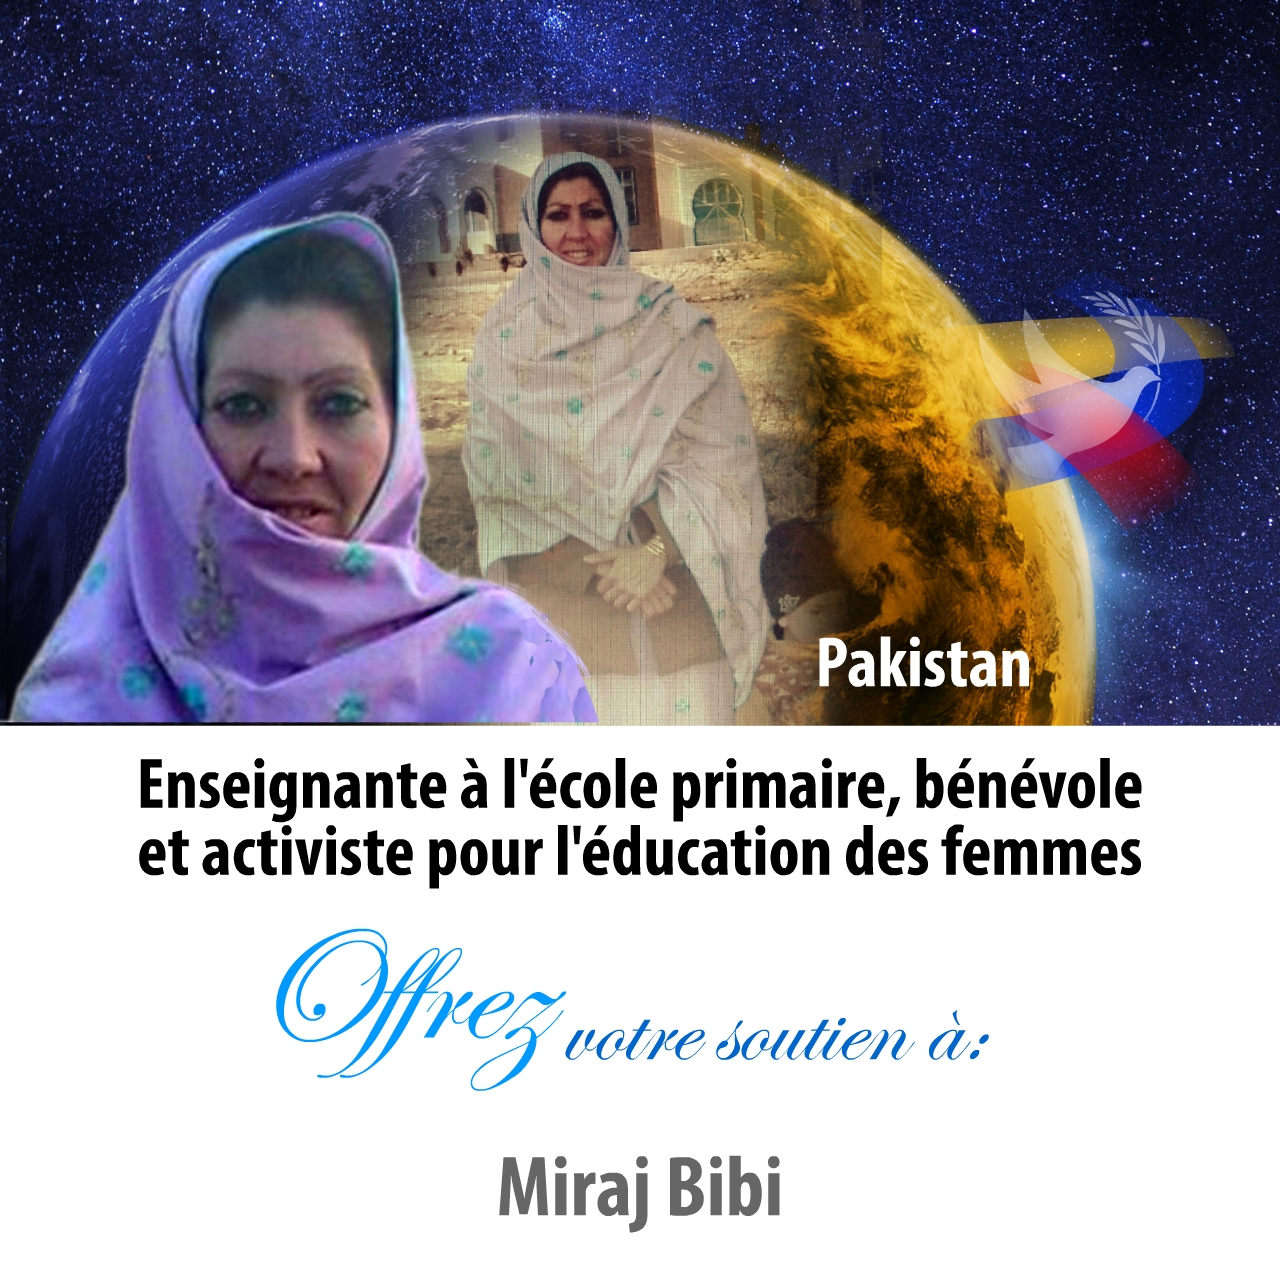 miraj-bibi-ppp-2018-fr